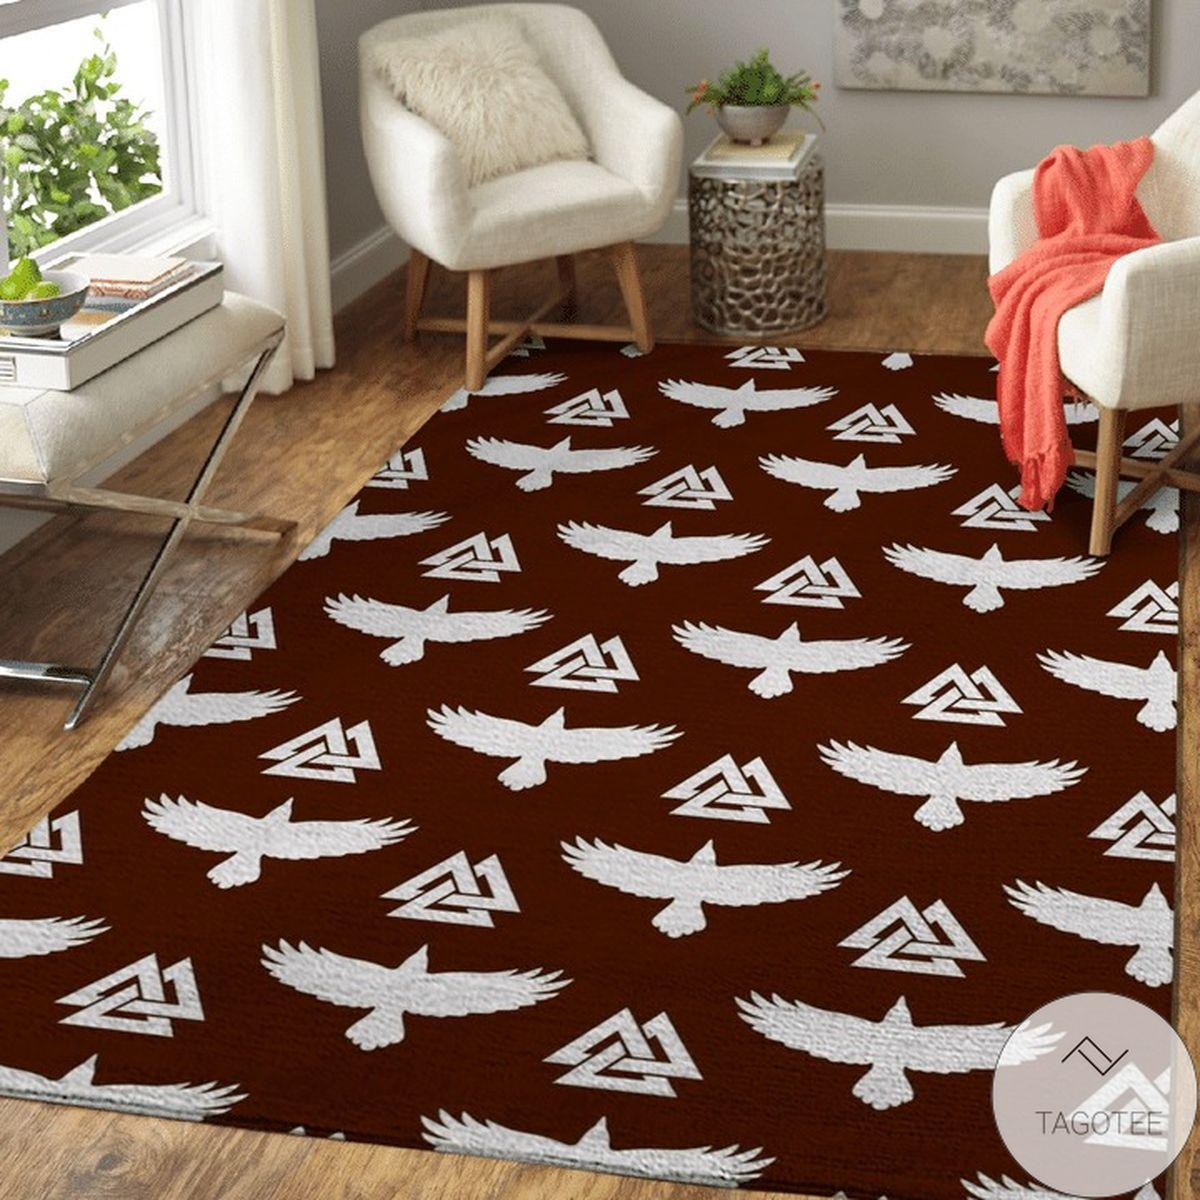 Best Shop Raven Valknut Pattern Viking Area Rug